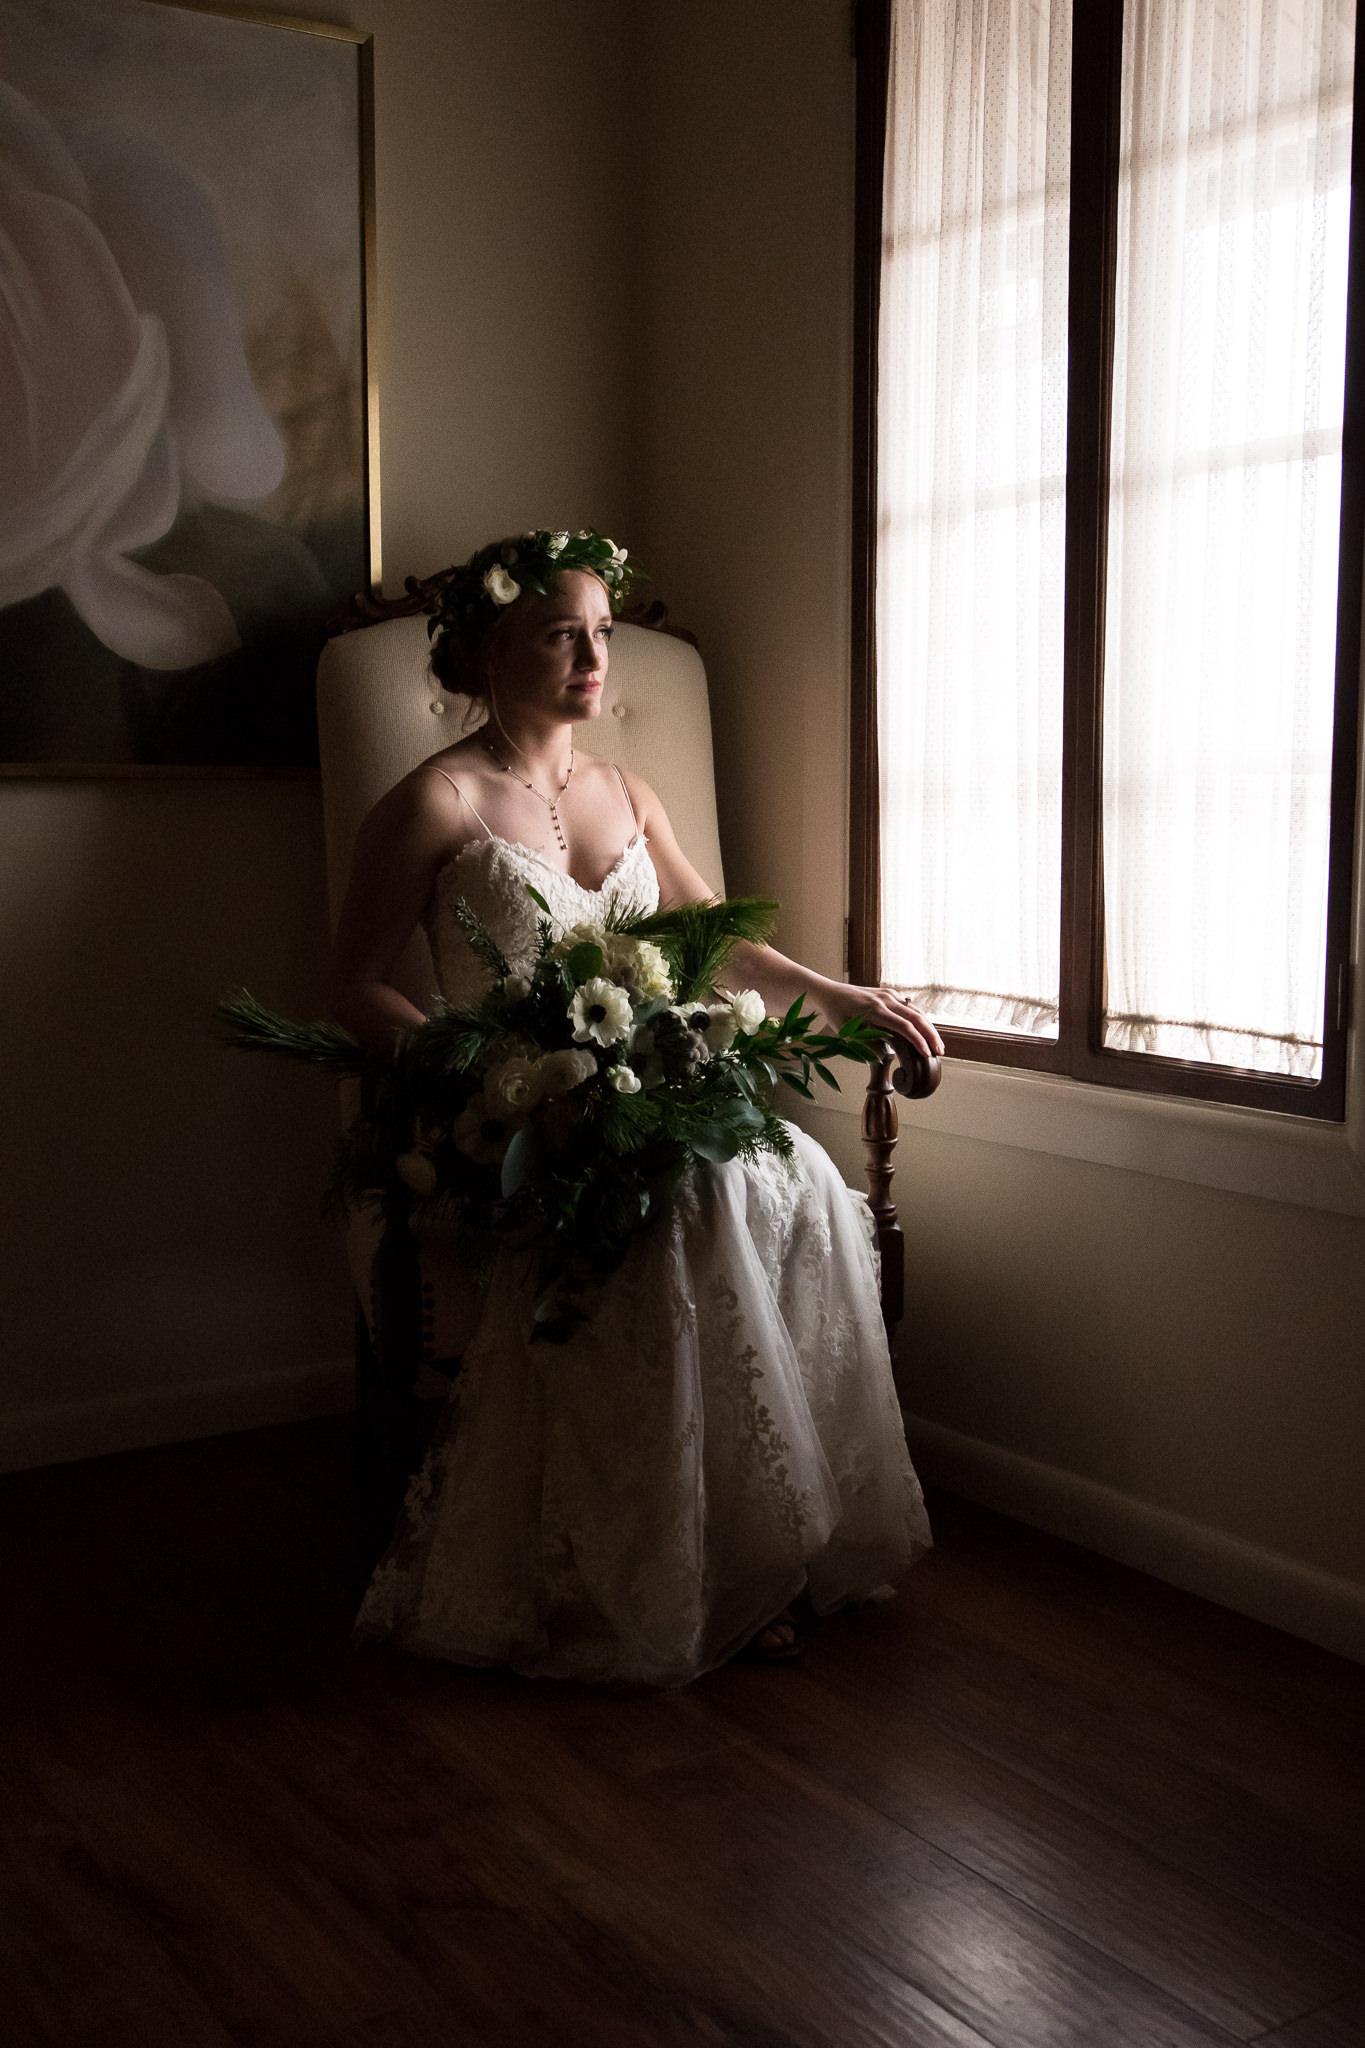 Trevor-Hooper-Wedding-Photographer-The-Bungalow-Wedding-Utah_CLR_030.jpg